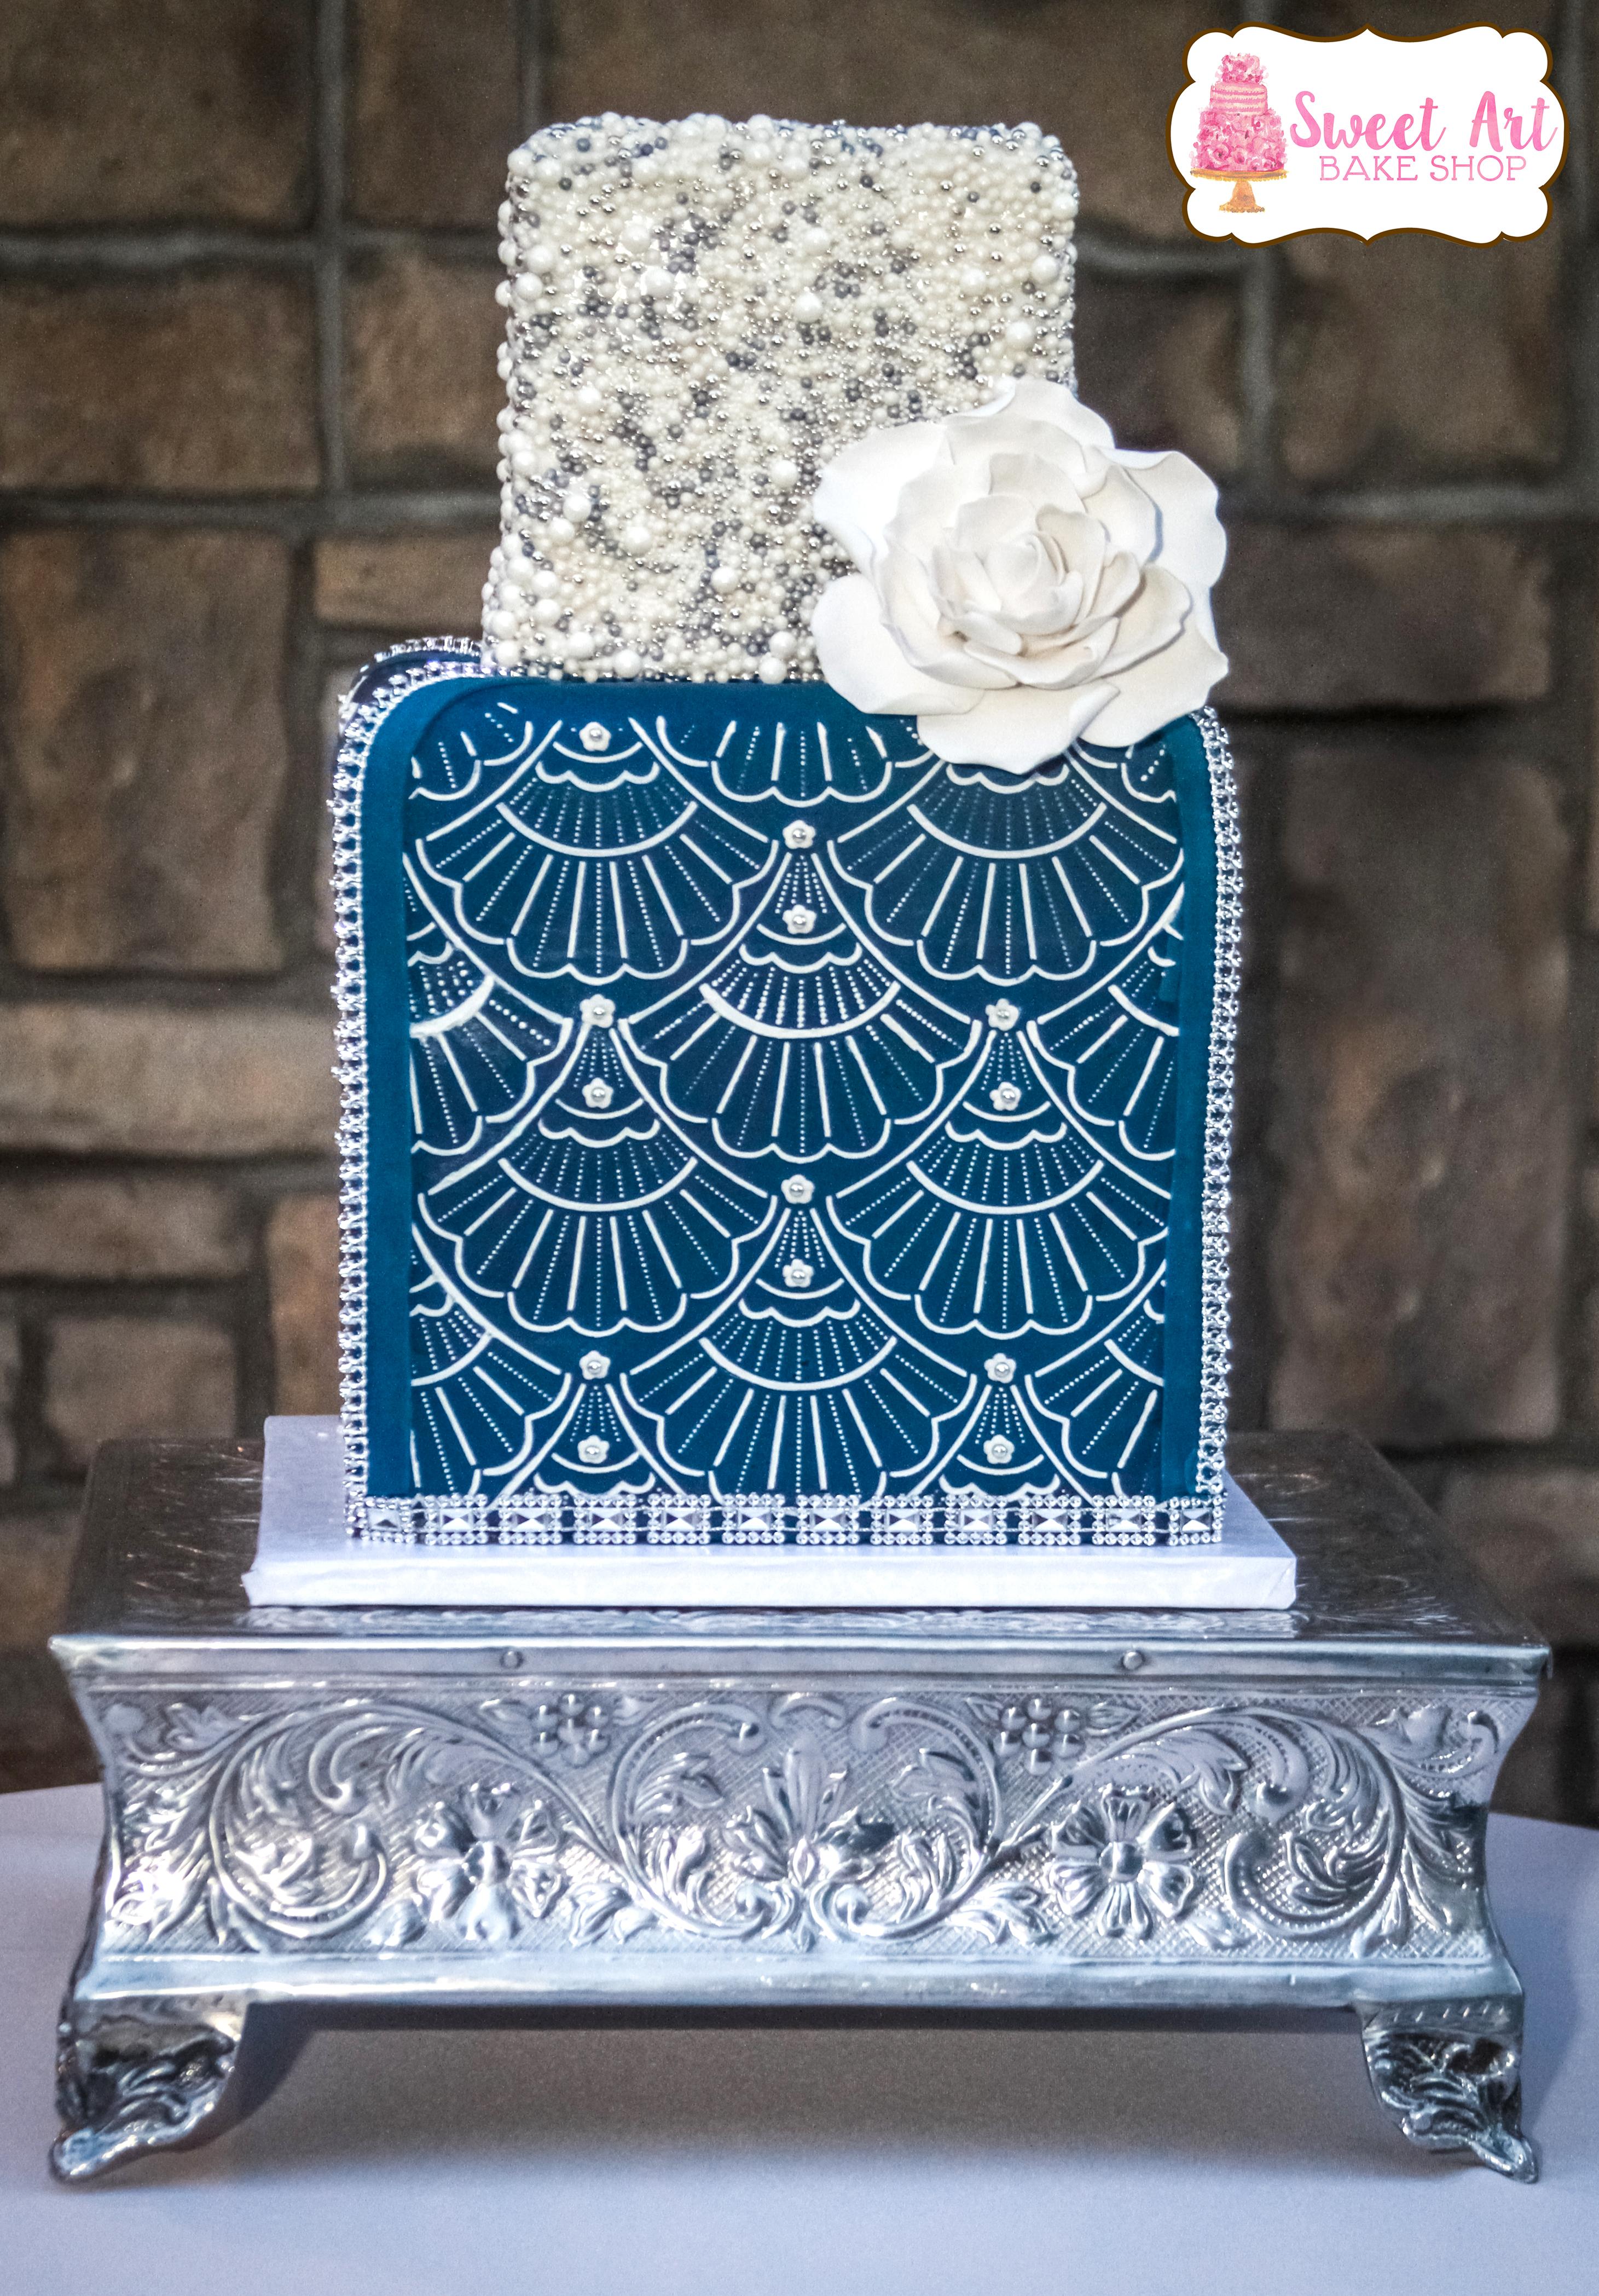 Navy, White & Silver Cake